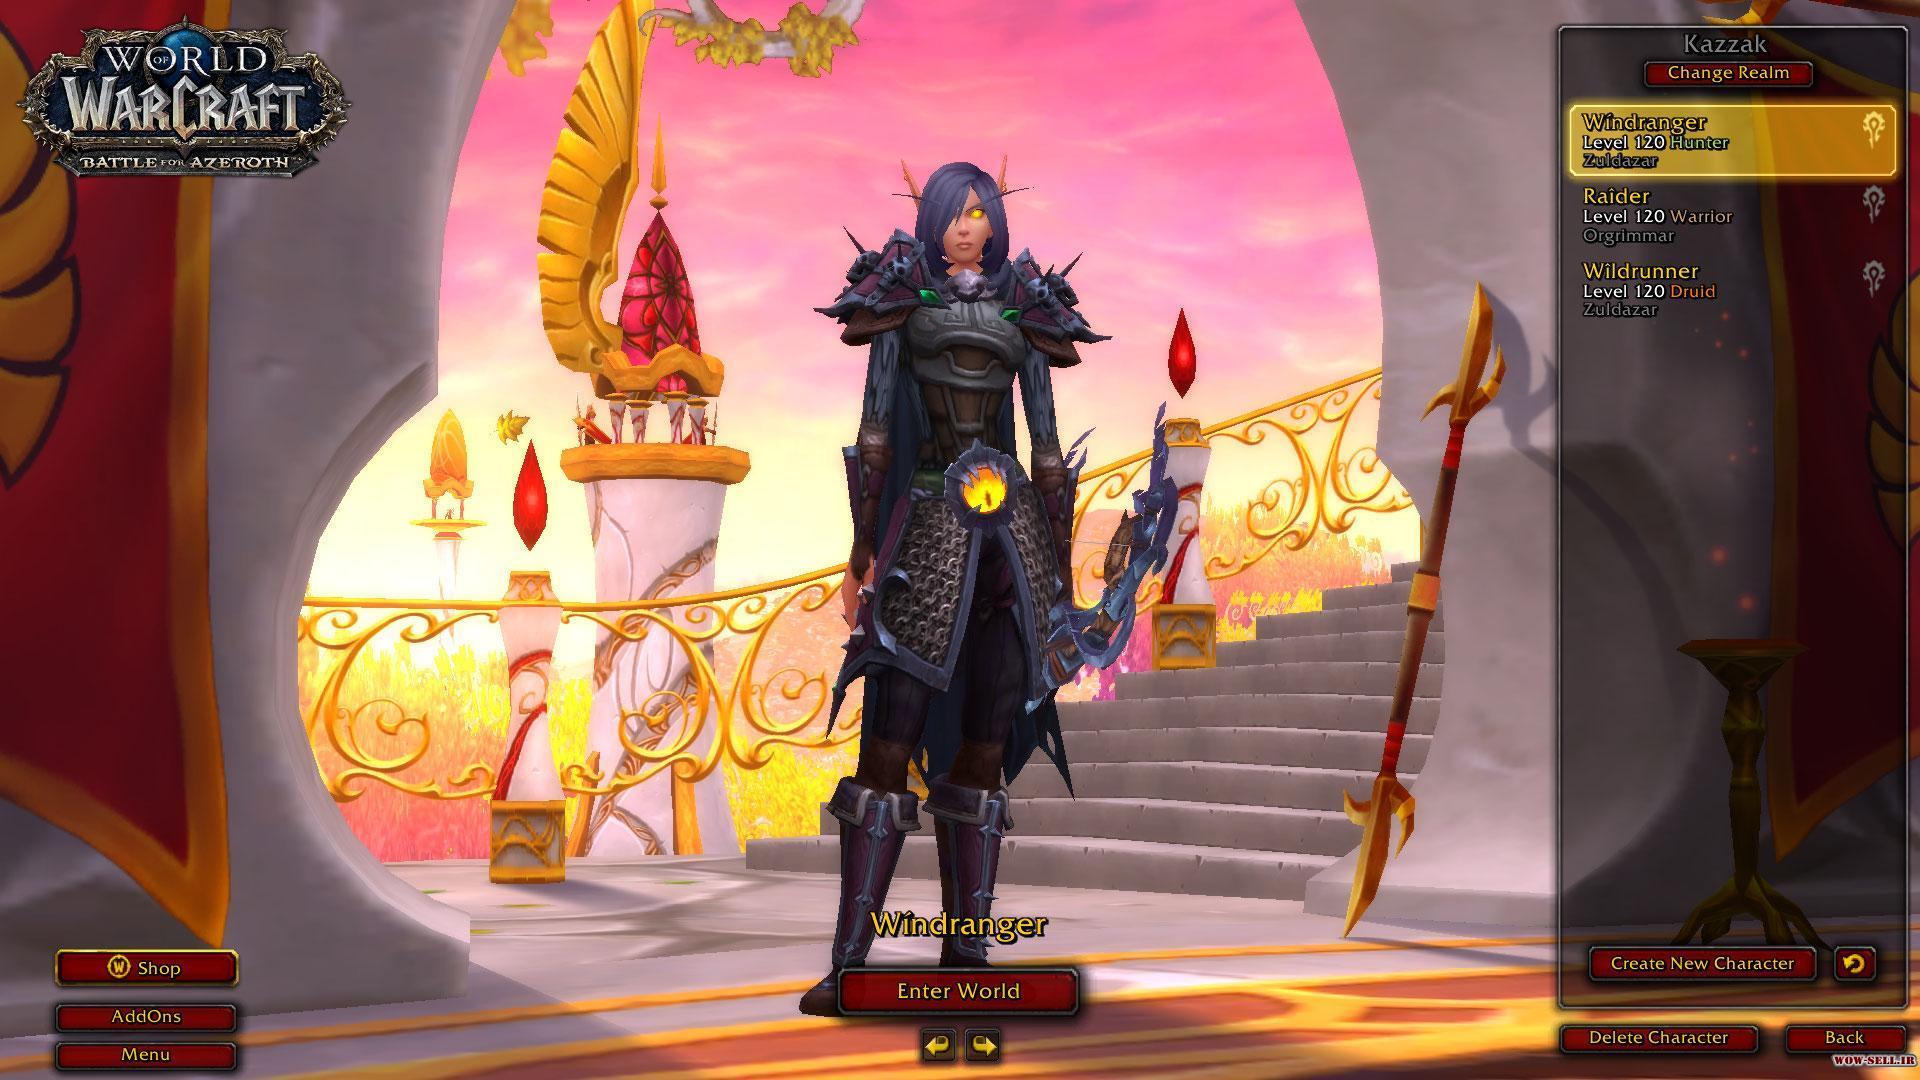 فروش اکانت wow - کد 1154 - کلاس هیرو ها : Hunter، Warrior، Druid - سرور Battle.net